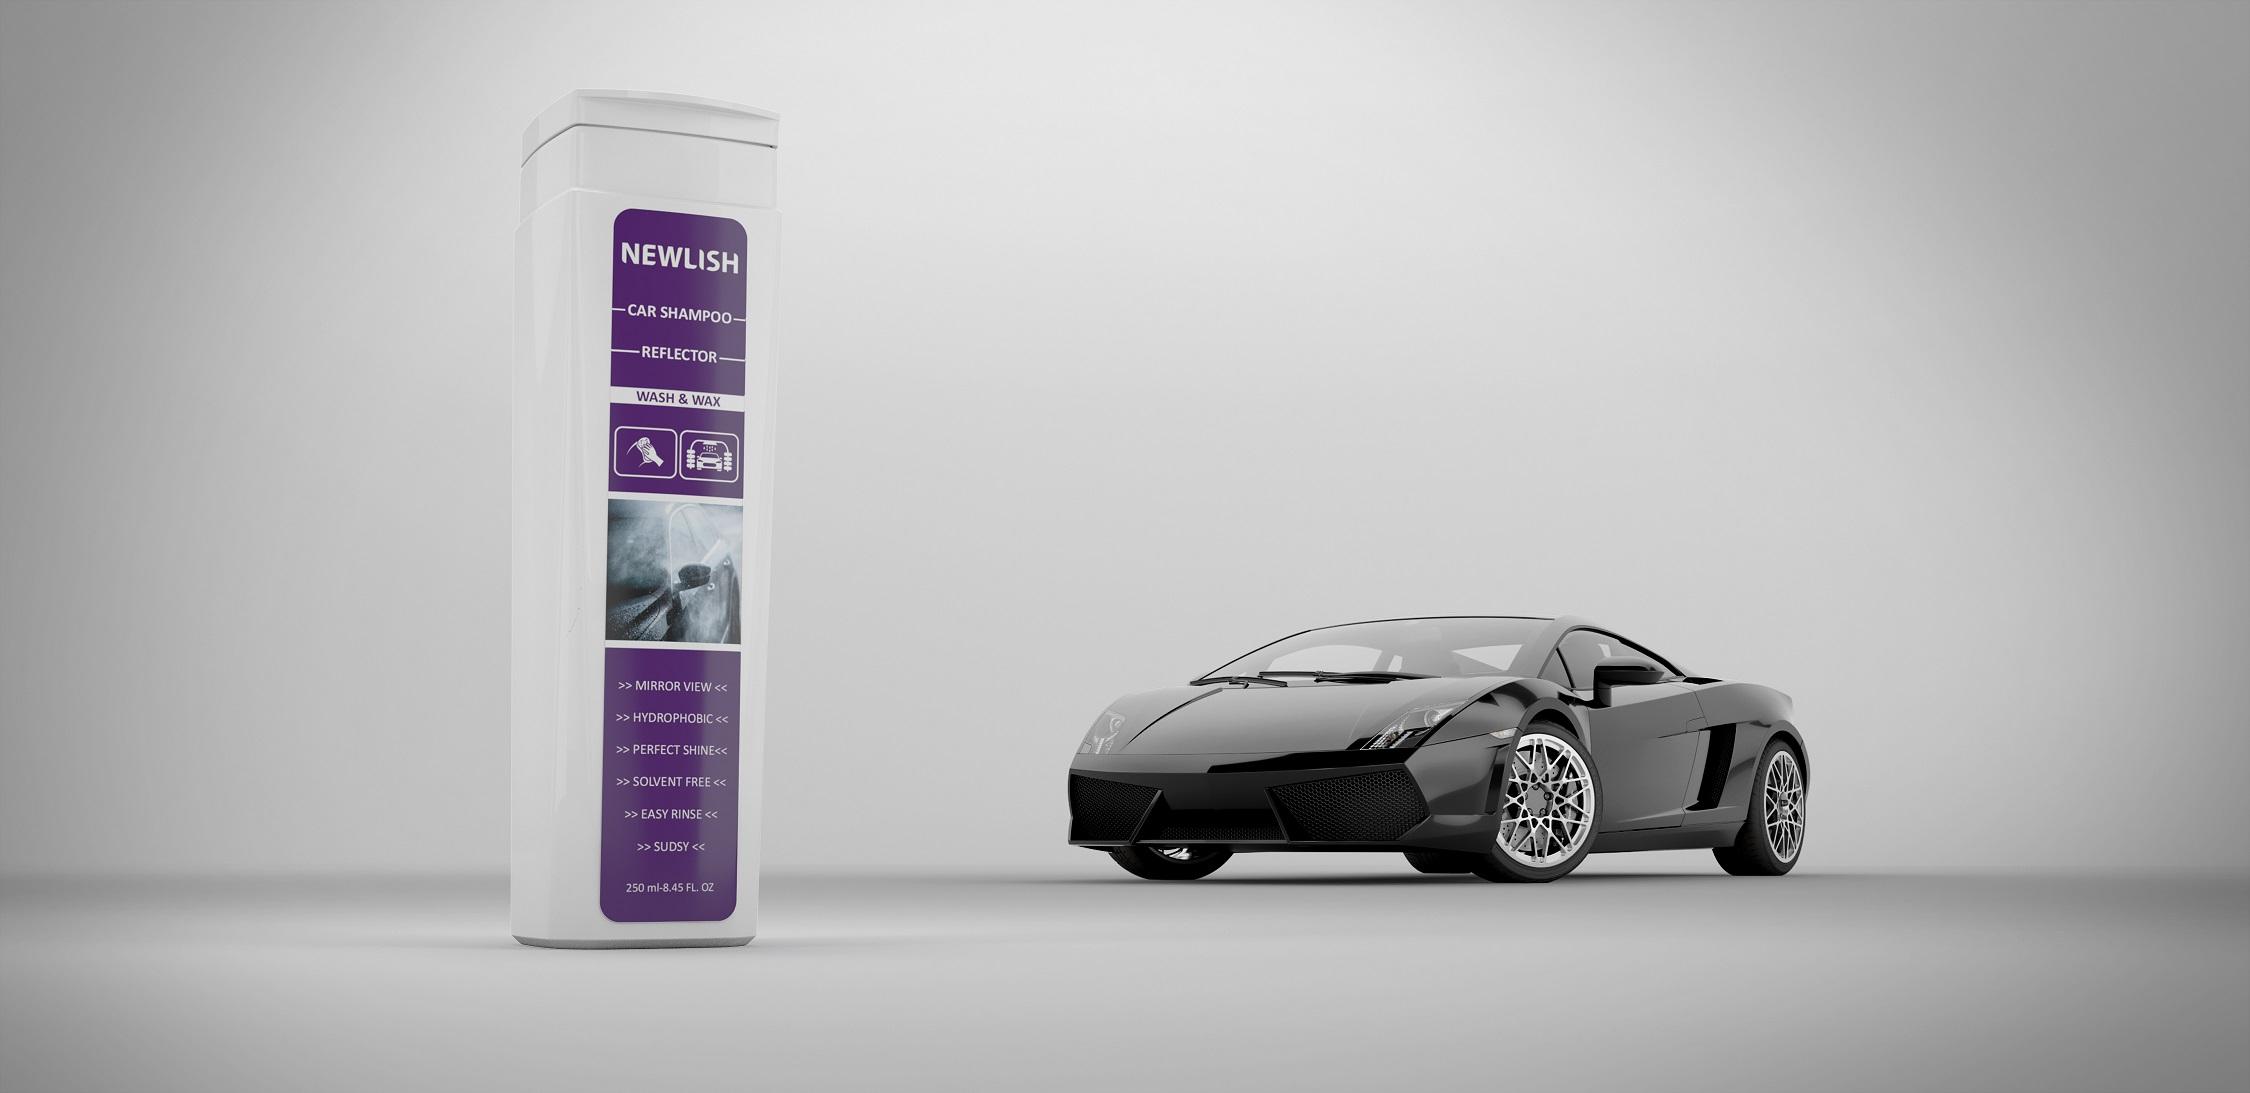 NEWLISH Car Shampoo Reflector Wash and W